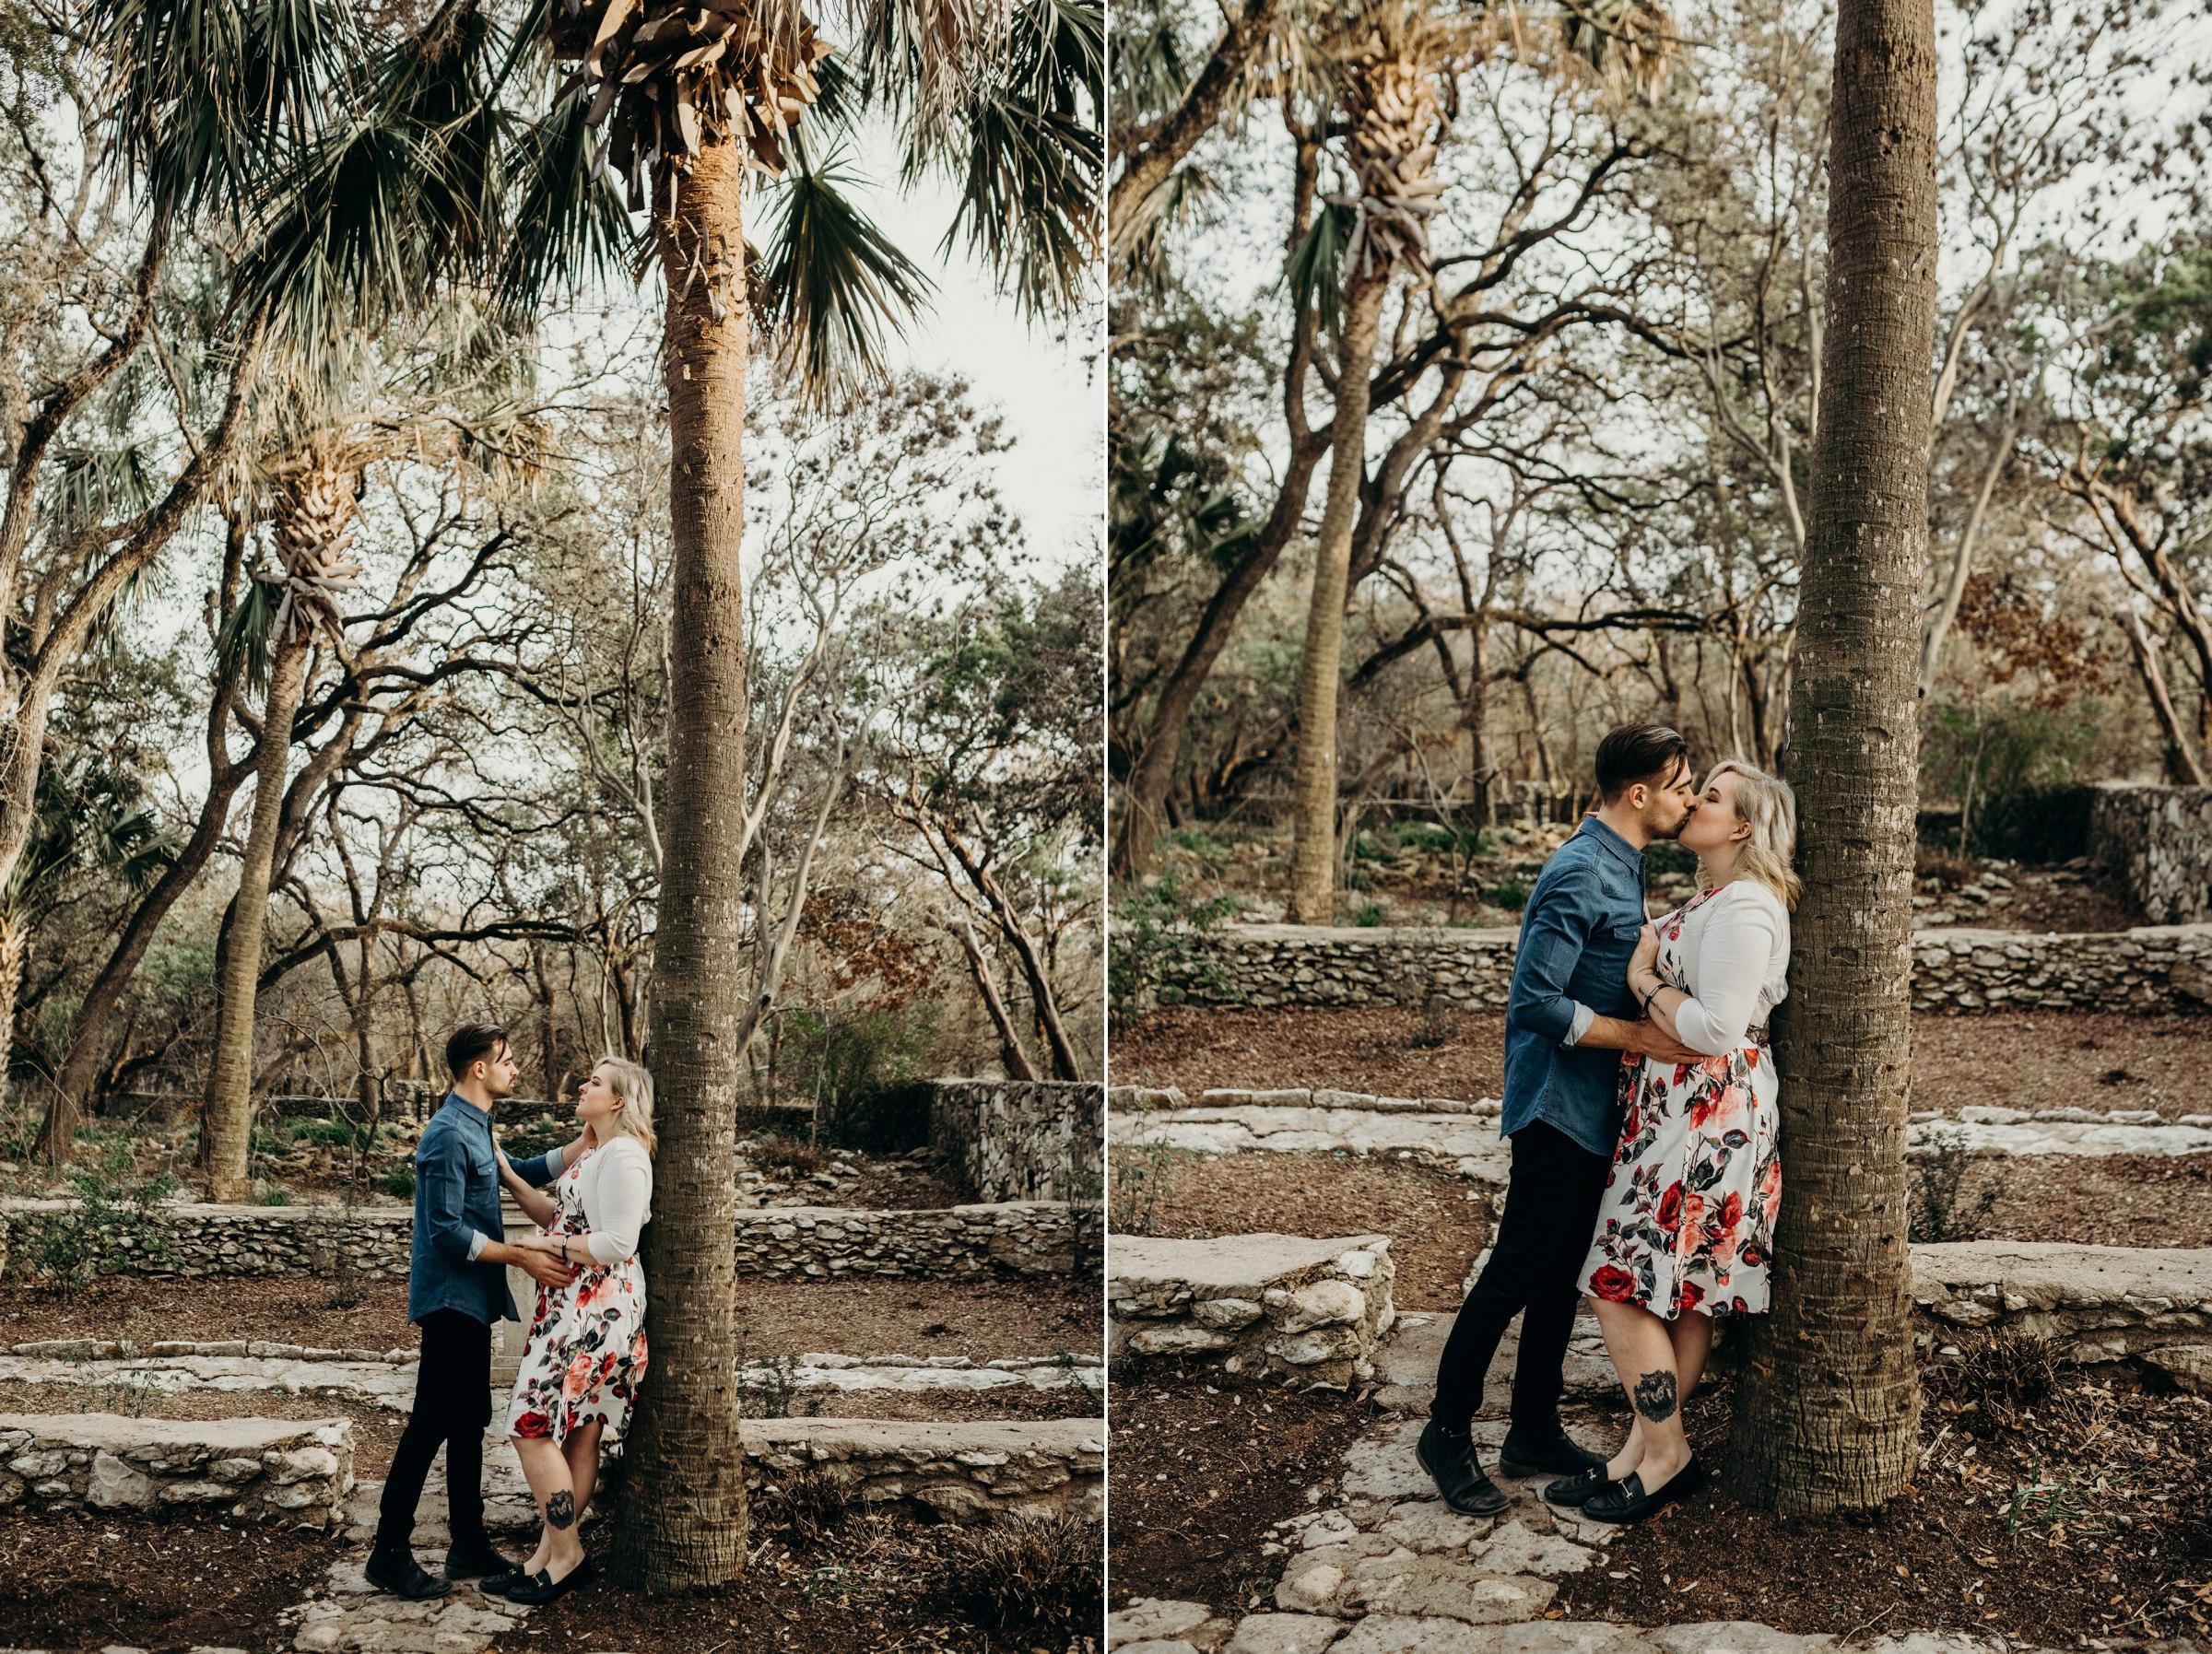 drew-andrew-texas-austin-minnesota-minneapolis-wedding-photographer-destination-elopement-intimate-adventurous_0090.jpg